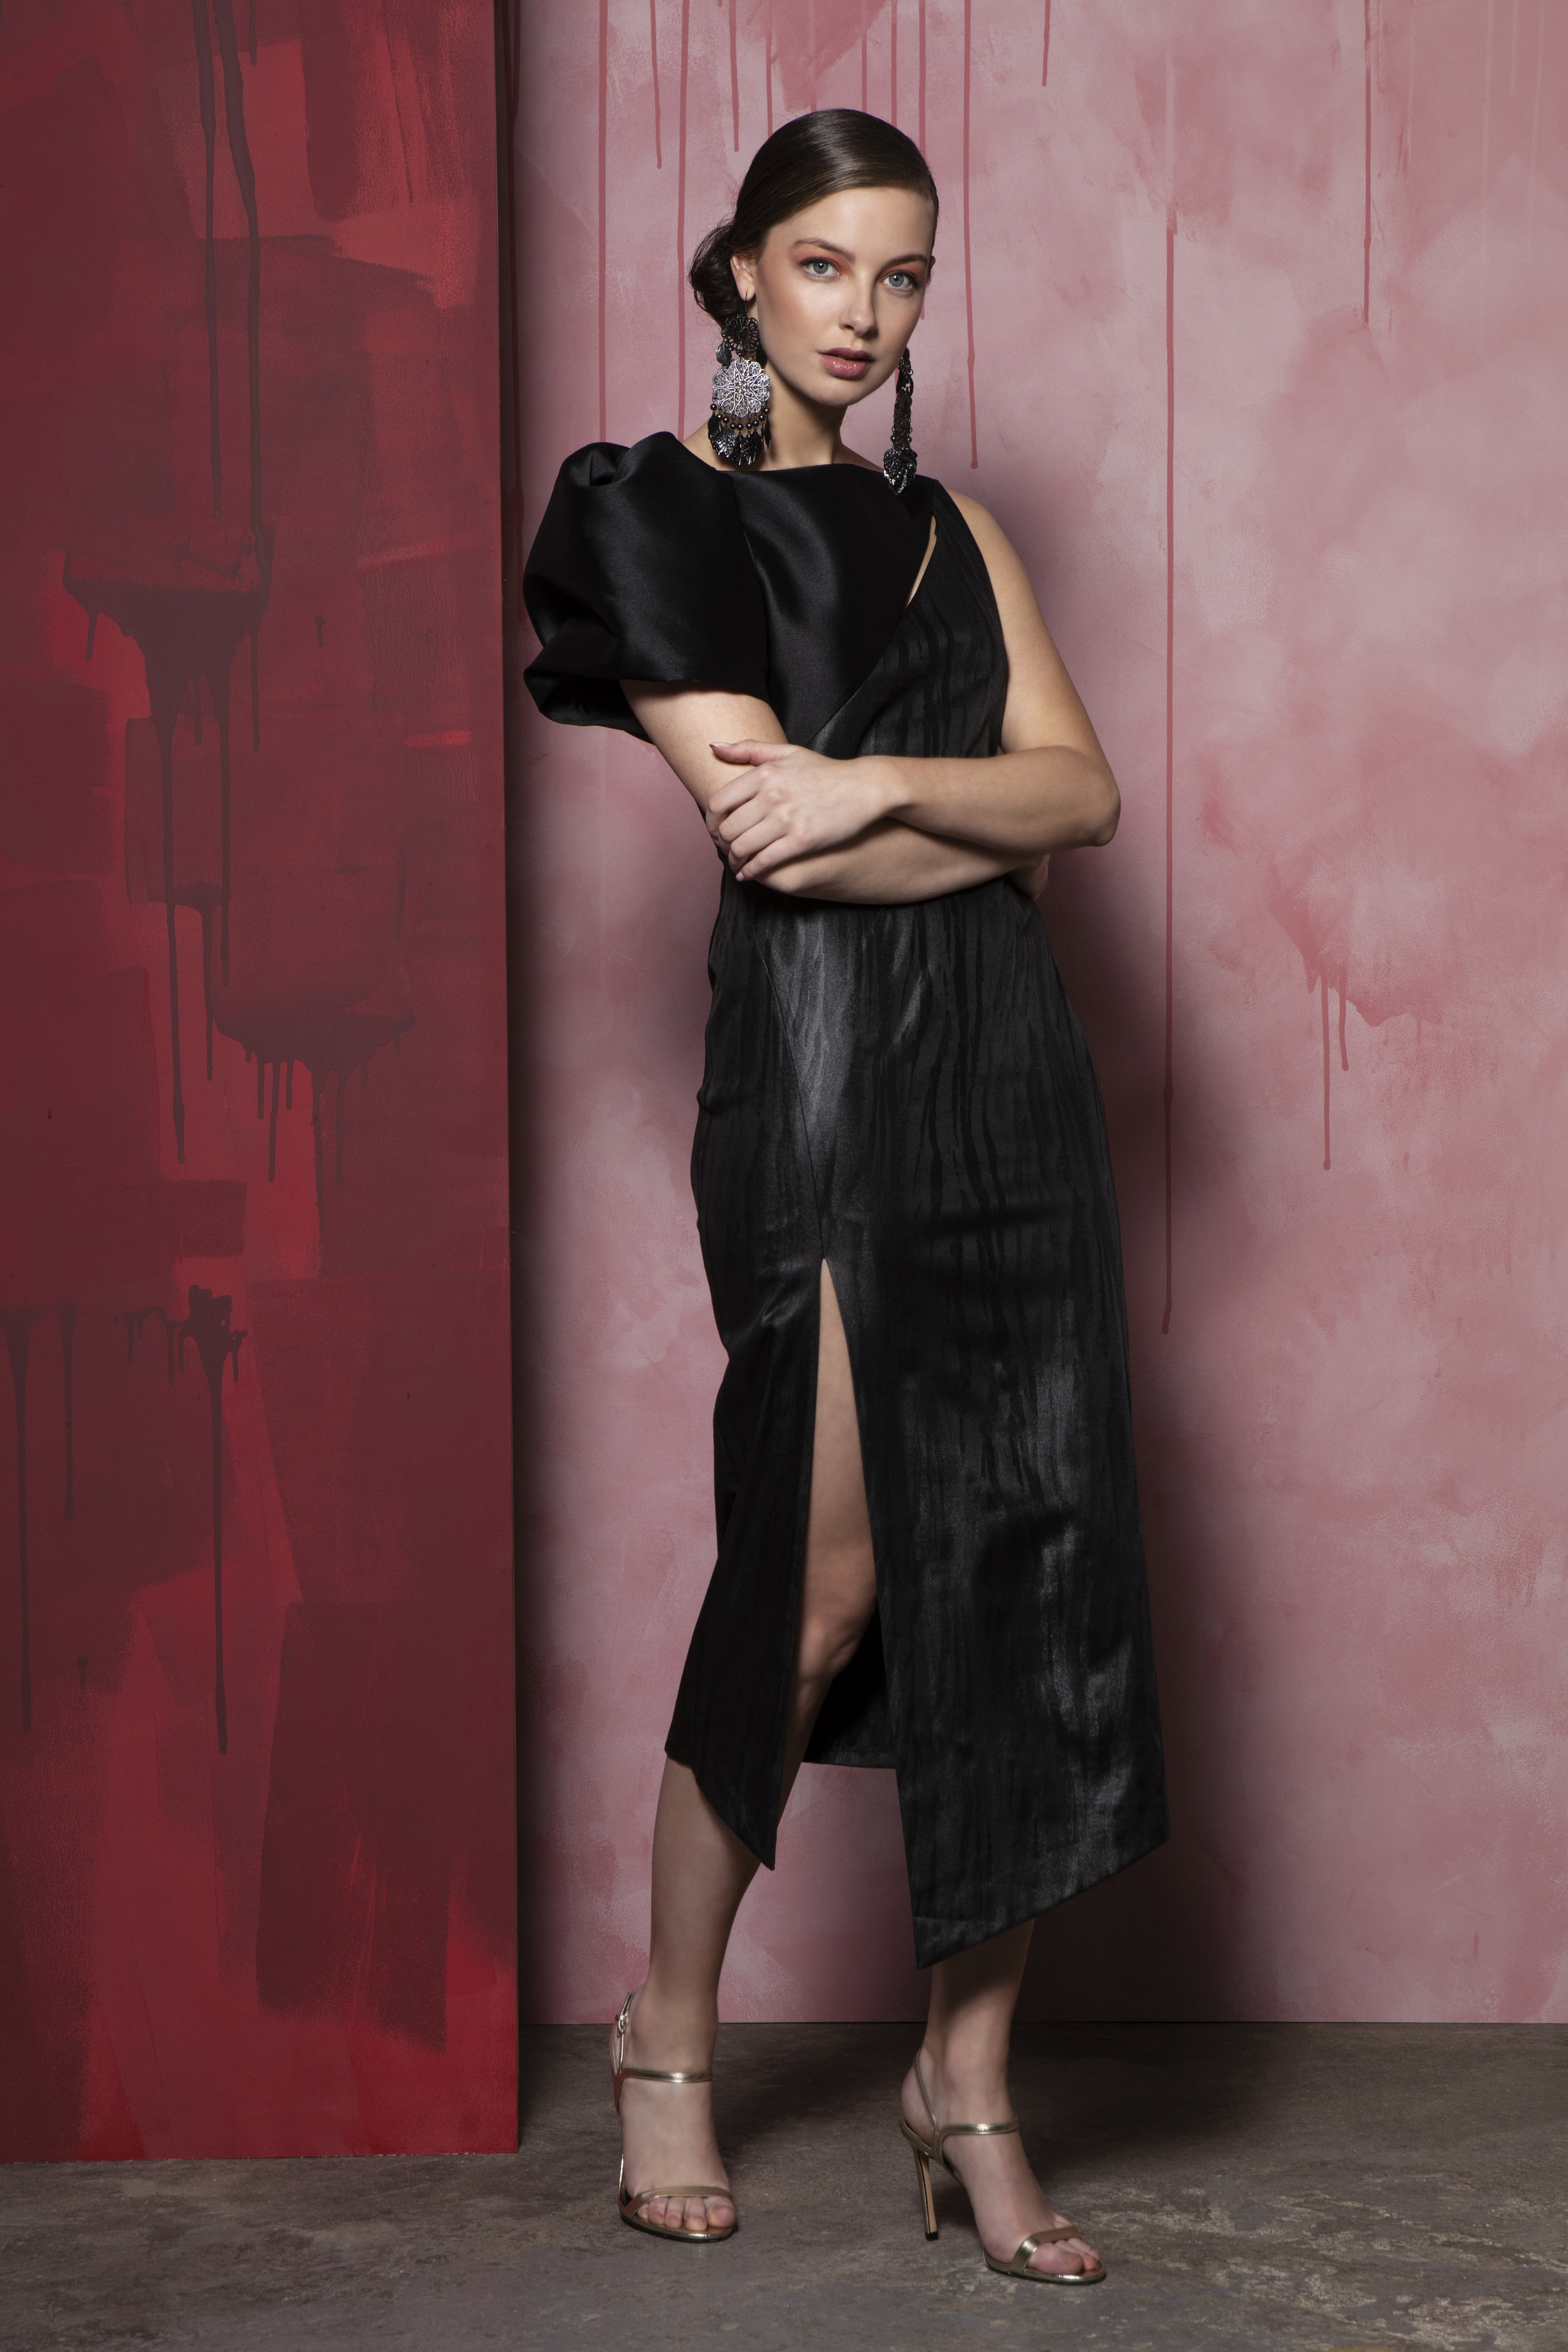 Diana dress, black leather jacquard, taffeta sleeve detail €270 (1).jpg